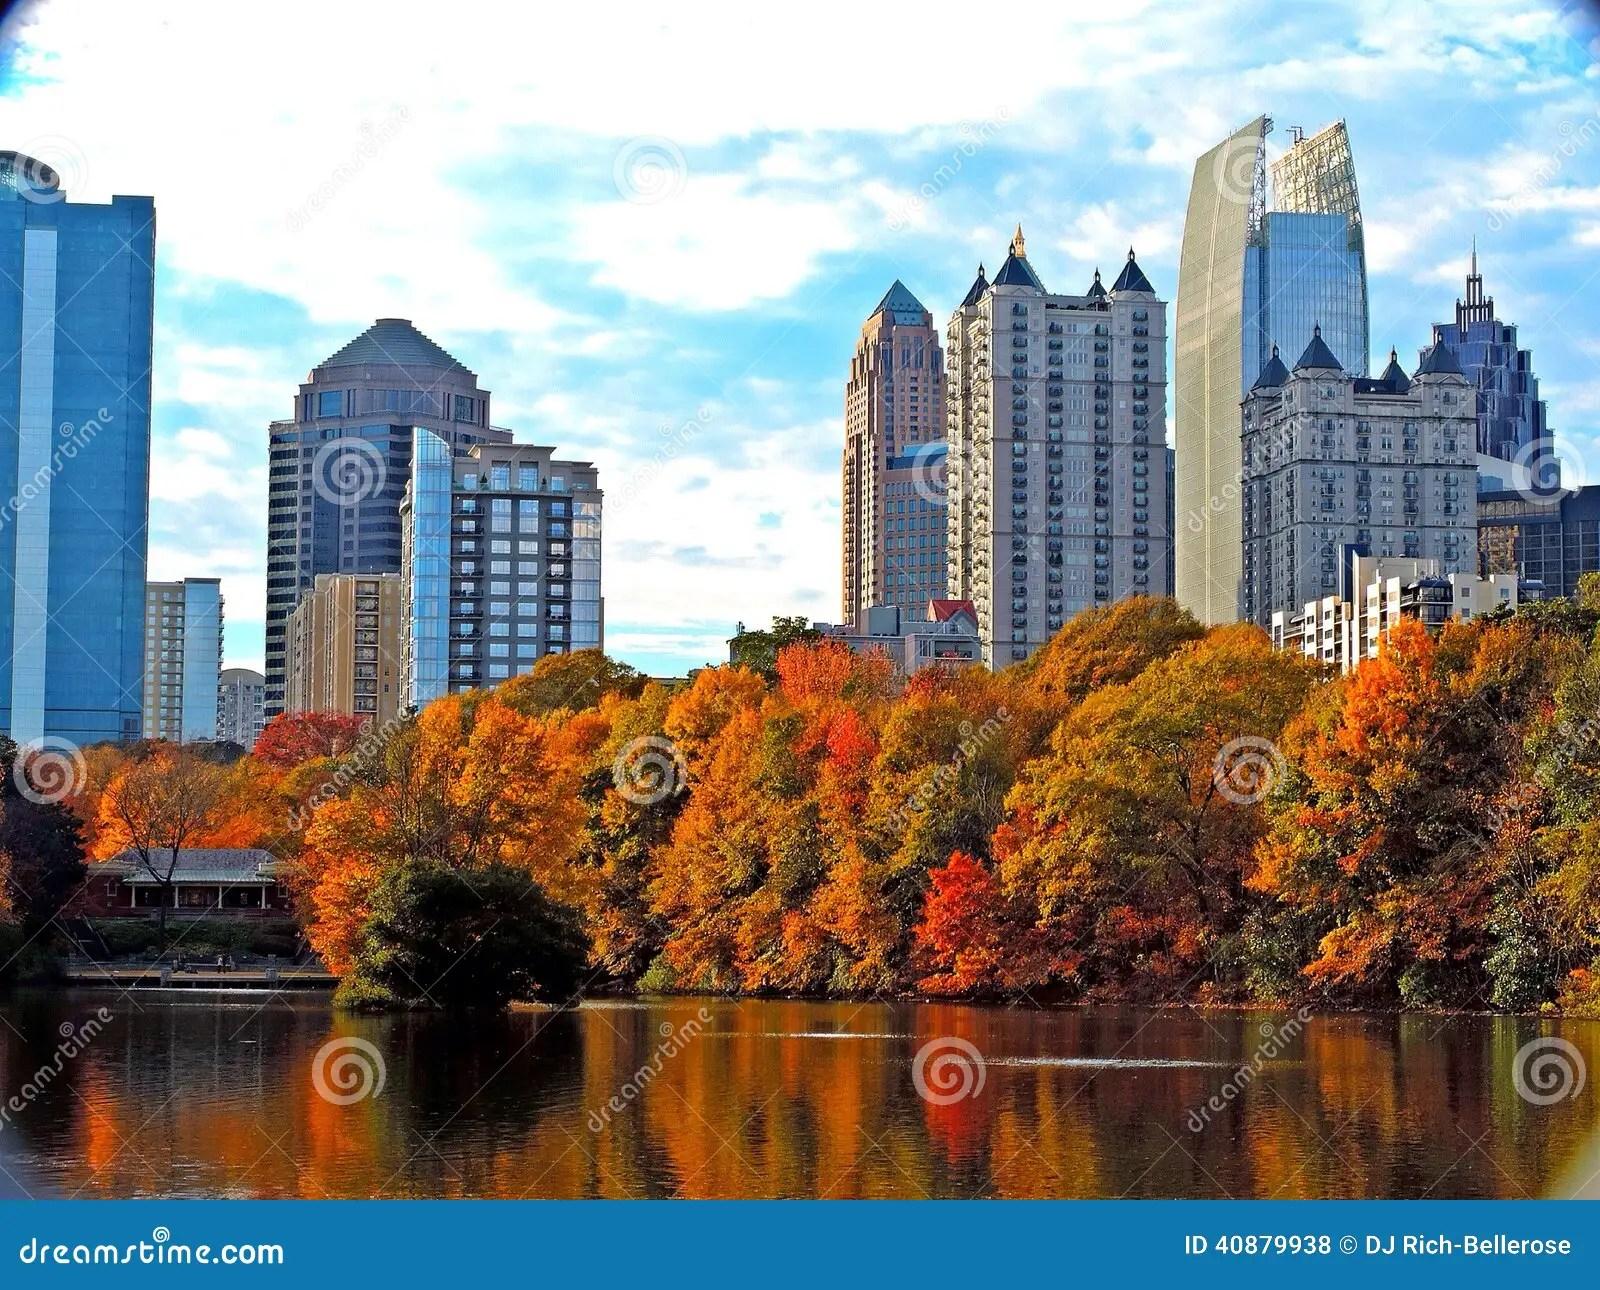 Free Hd Fall Desktop Wallpaper Atlanta Skyline Stock Photo Image 40879938